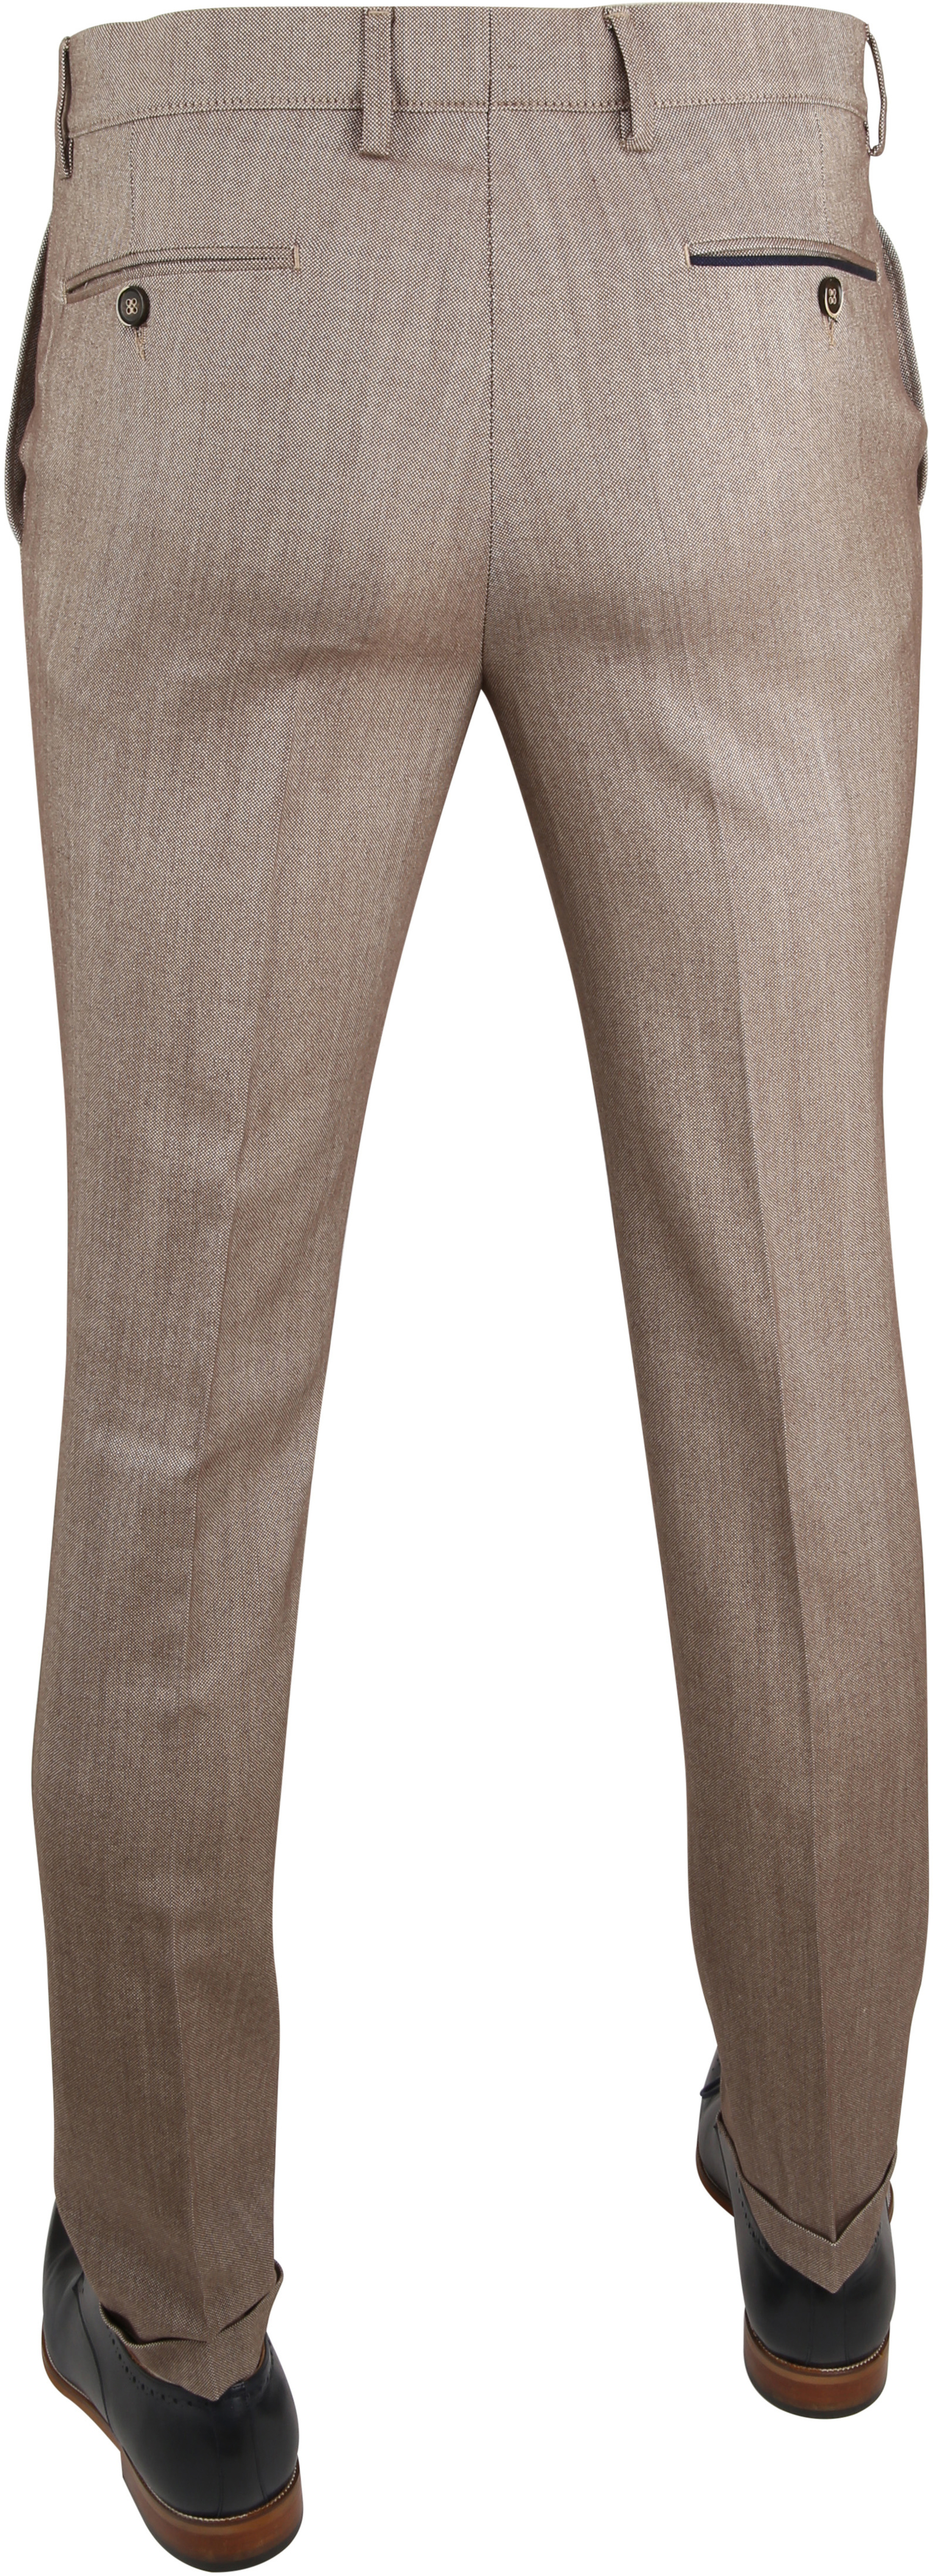 Suitable Premium Pantalon Rimini Bruin foto 1